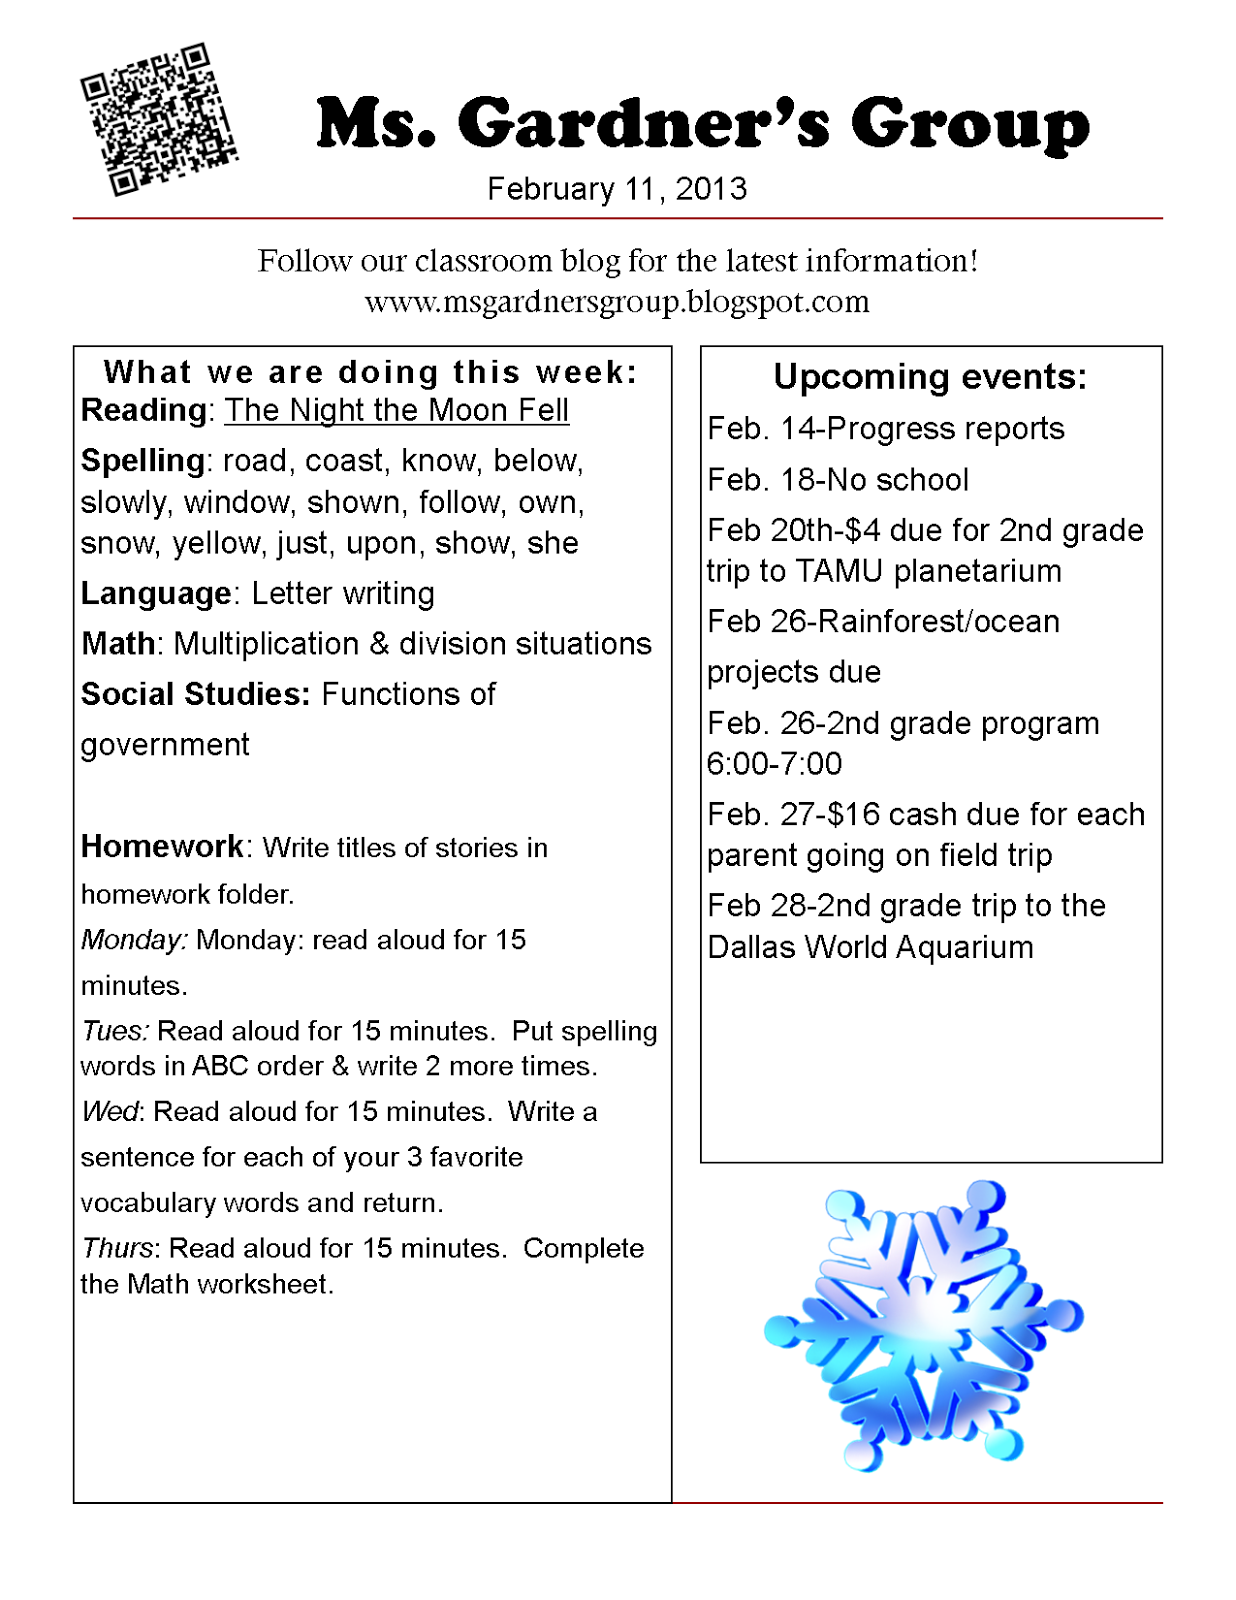 Ms. Gardner's Group: February 2013 [ 1600 x 1236 Pixel ]